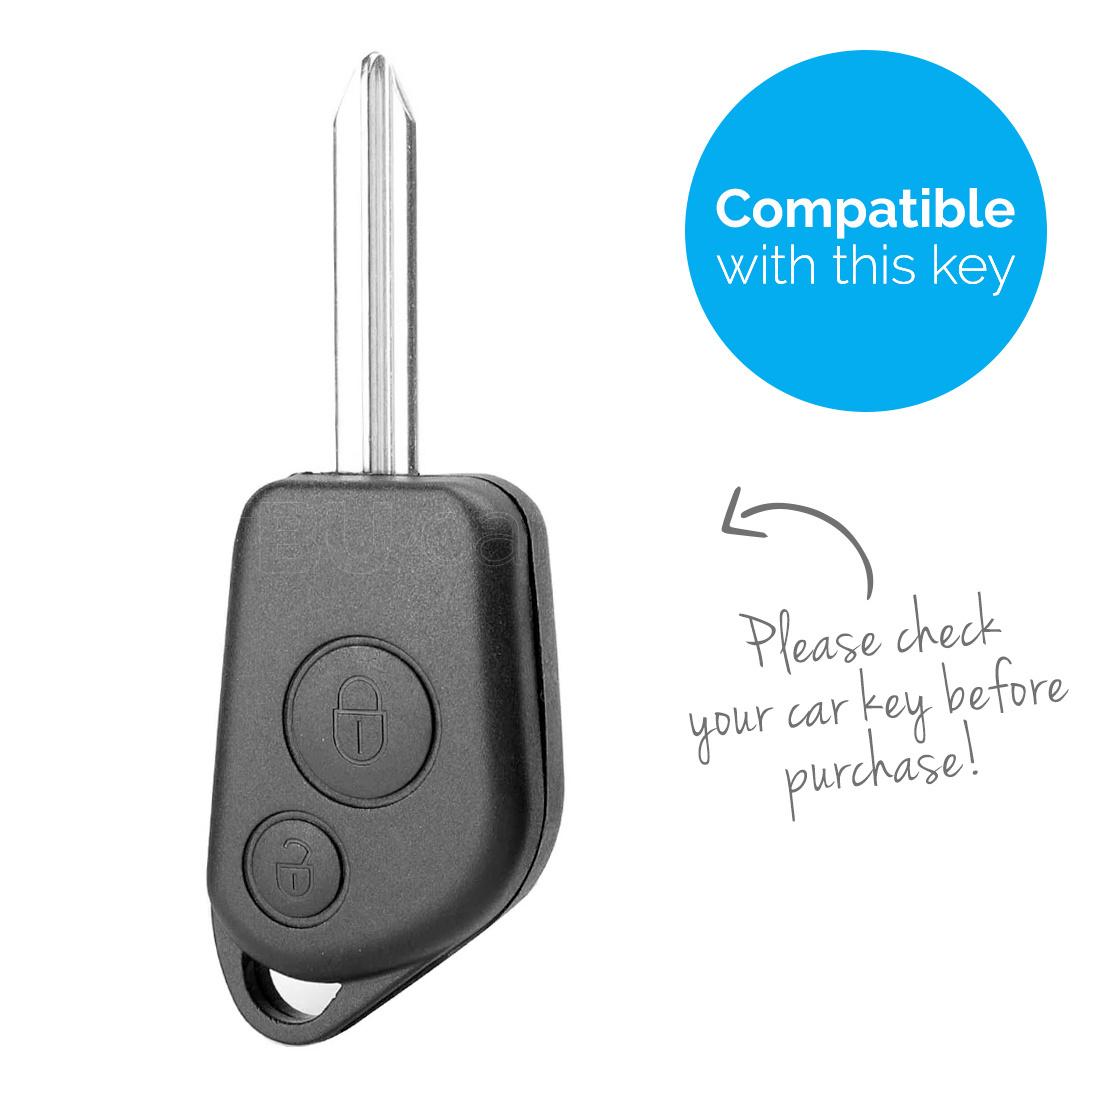 TBU car Autoschlüssel Hülle für Peugeot 2 Tasten - Schutzhülle aus Silikon - Auto Schlüsselhülle Cover in Rot